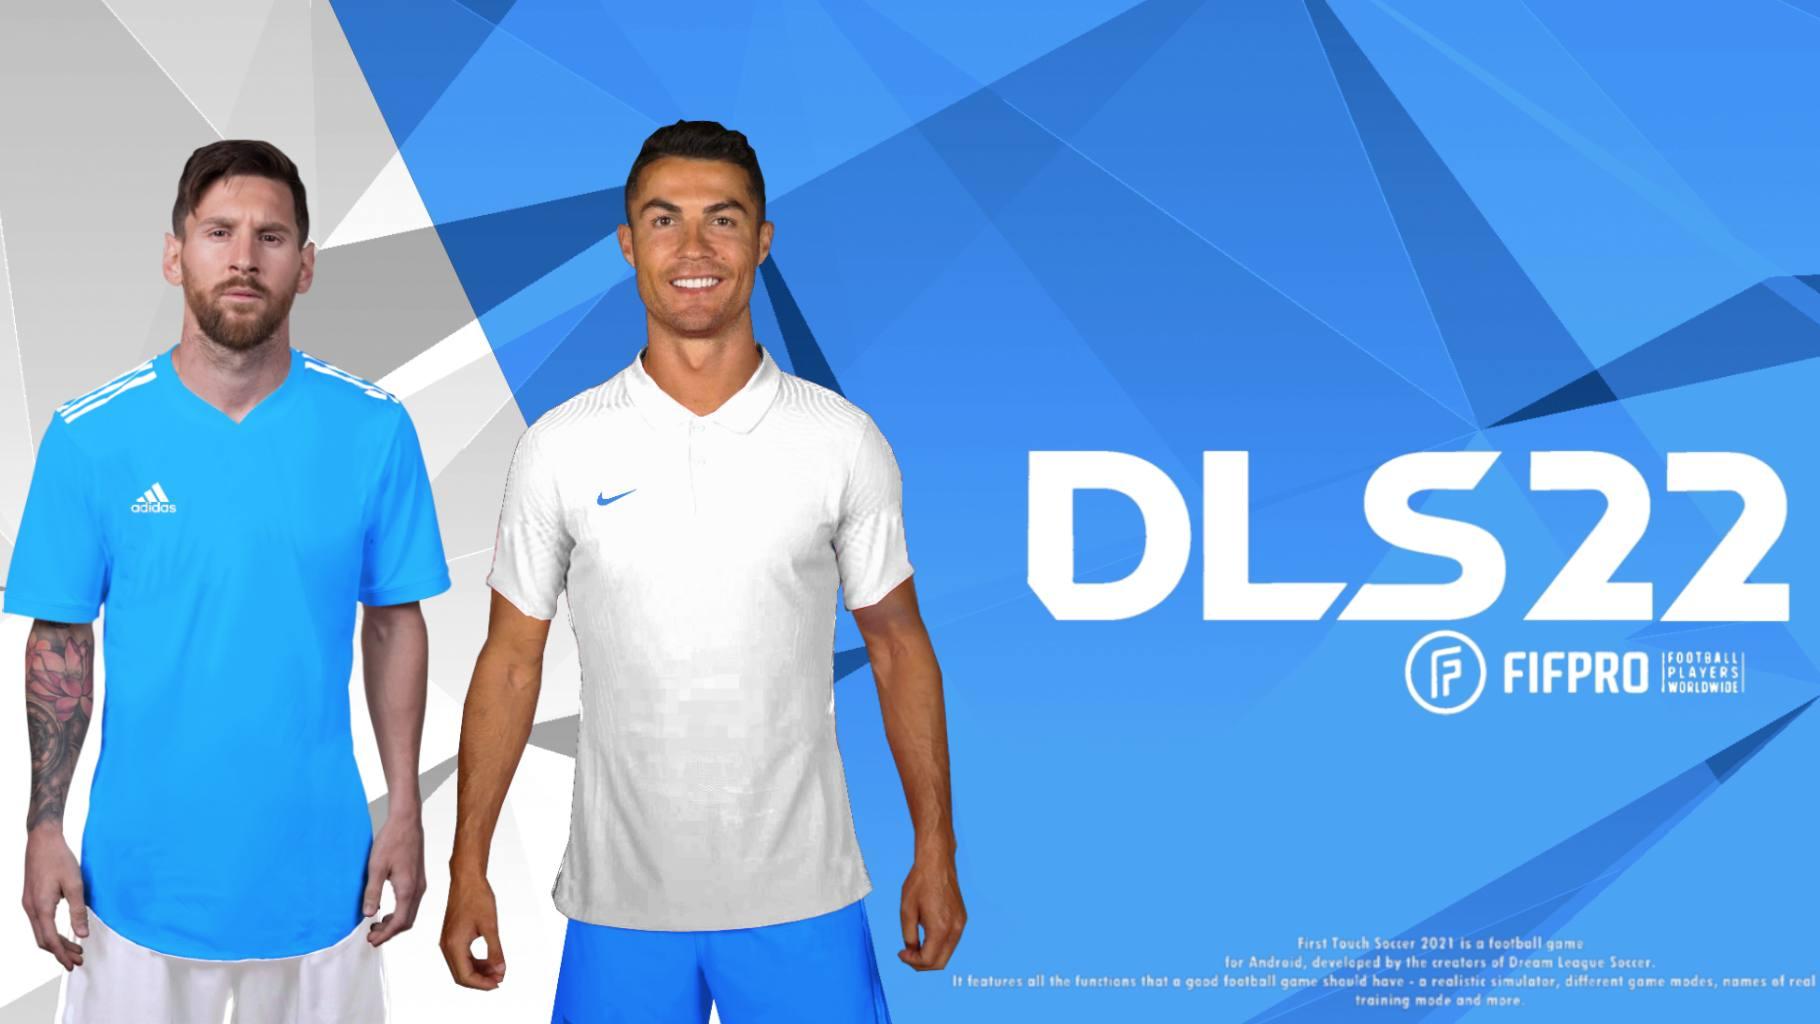 Dream League Soccer 2022 Android – DLS 22 Apk Obb Download